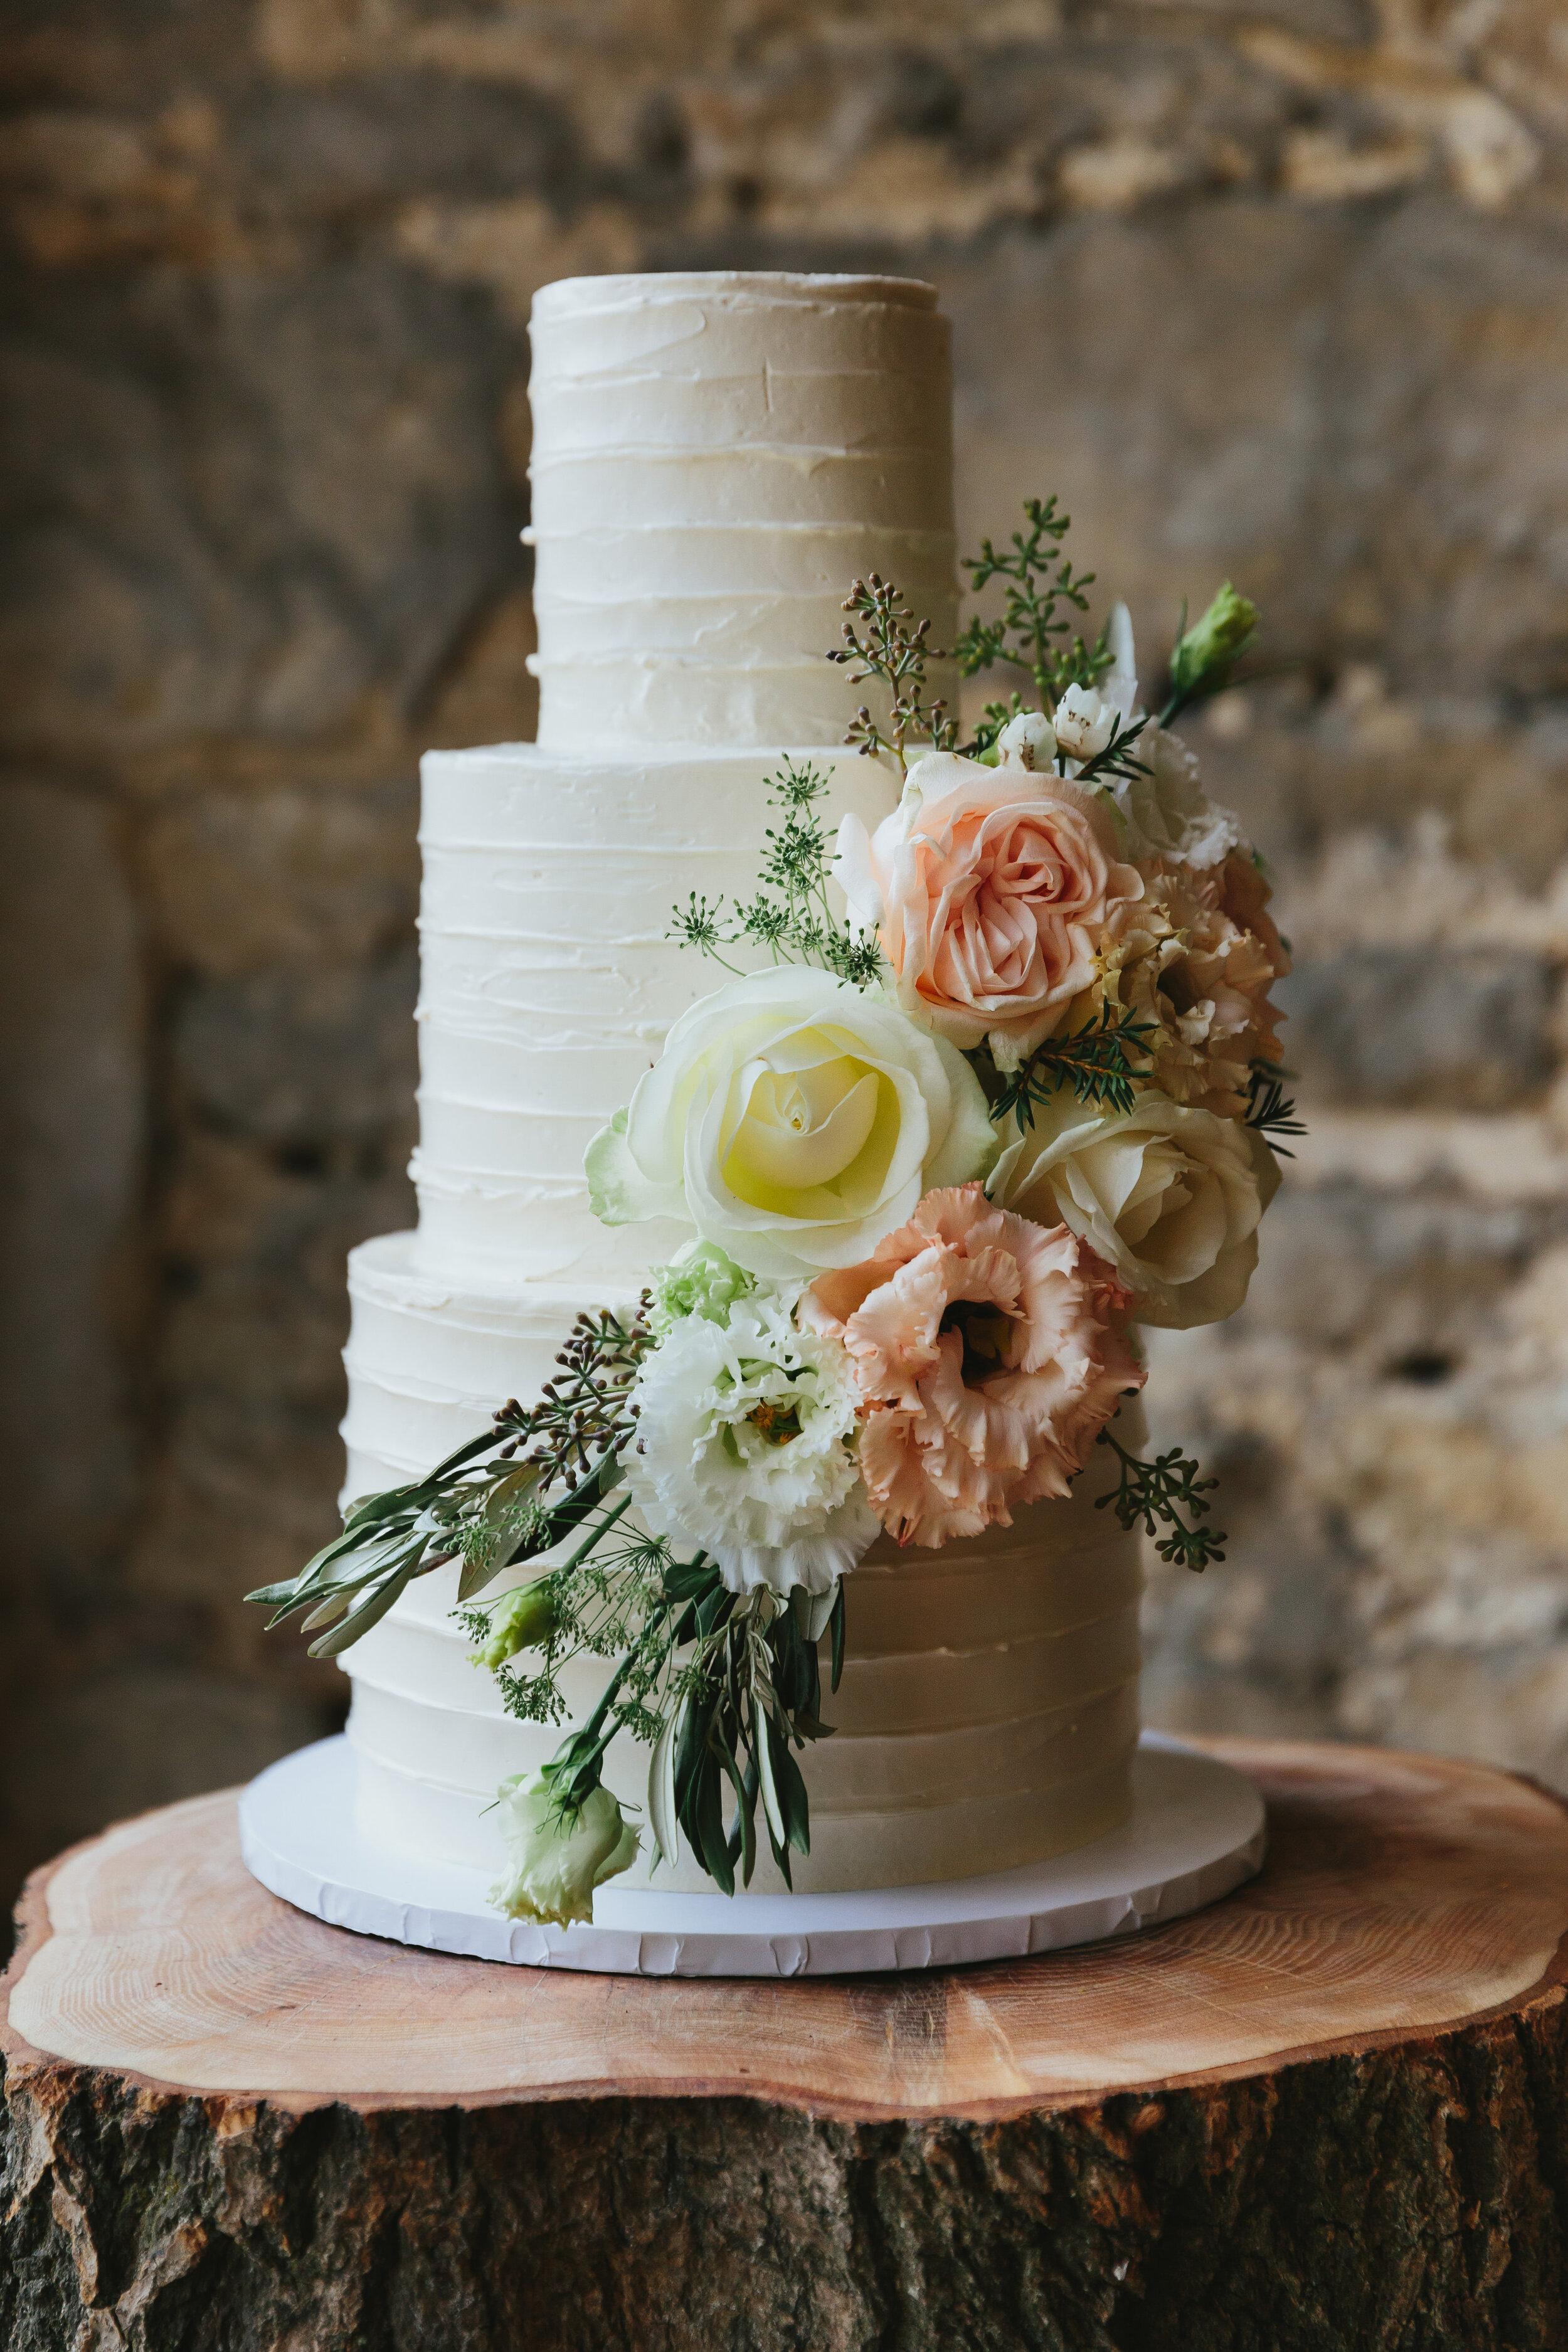 Rustic_buttercream_wedding_cake_with_flowers.jpg